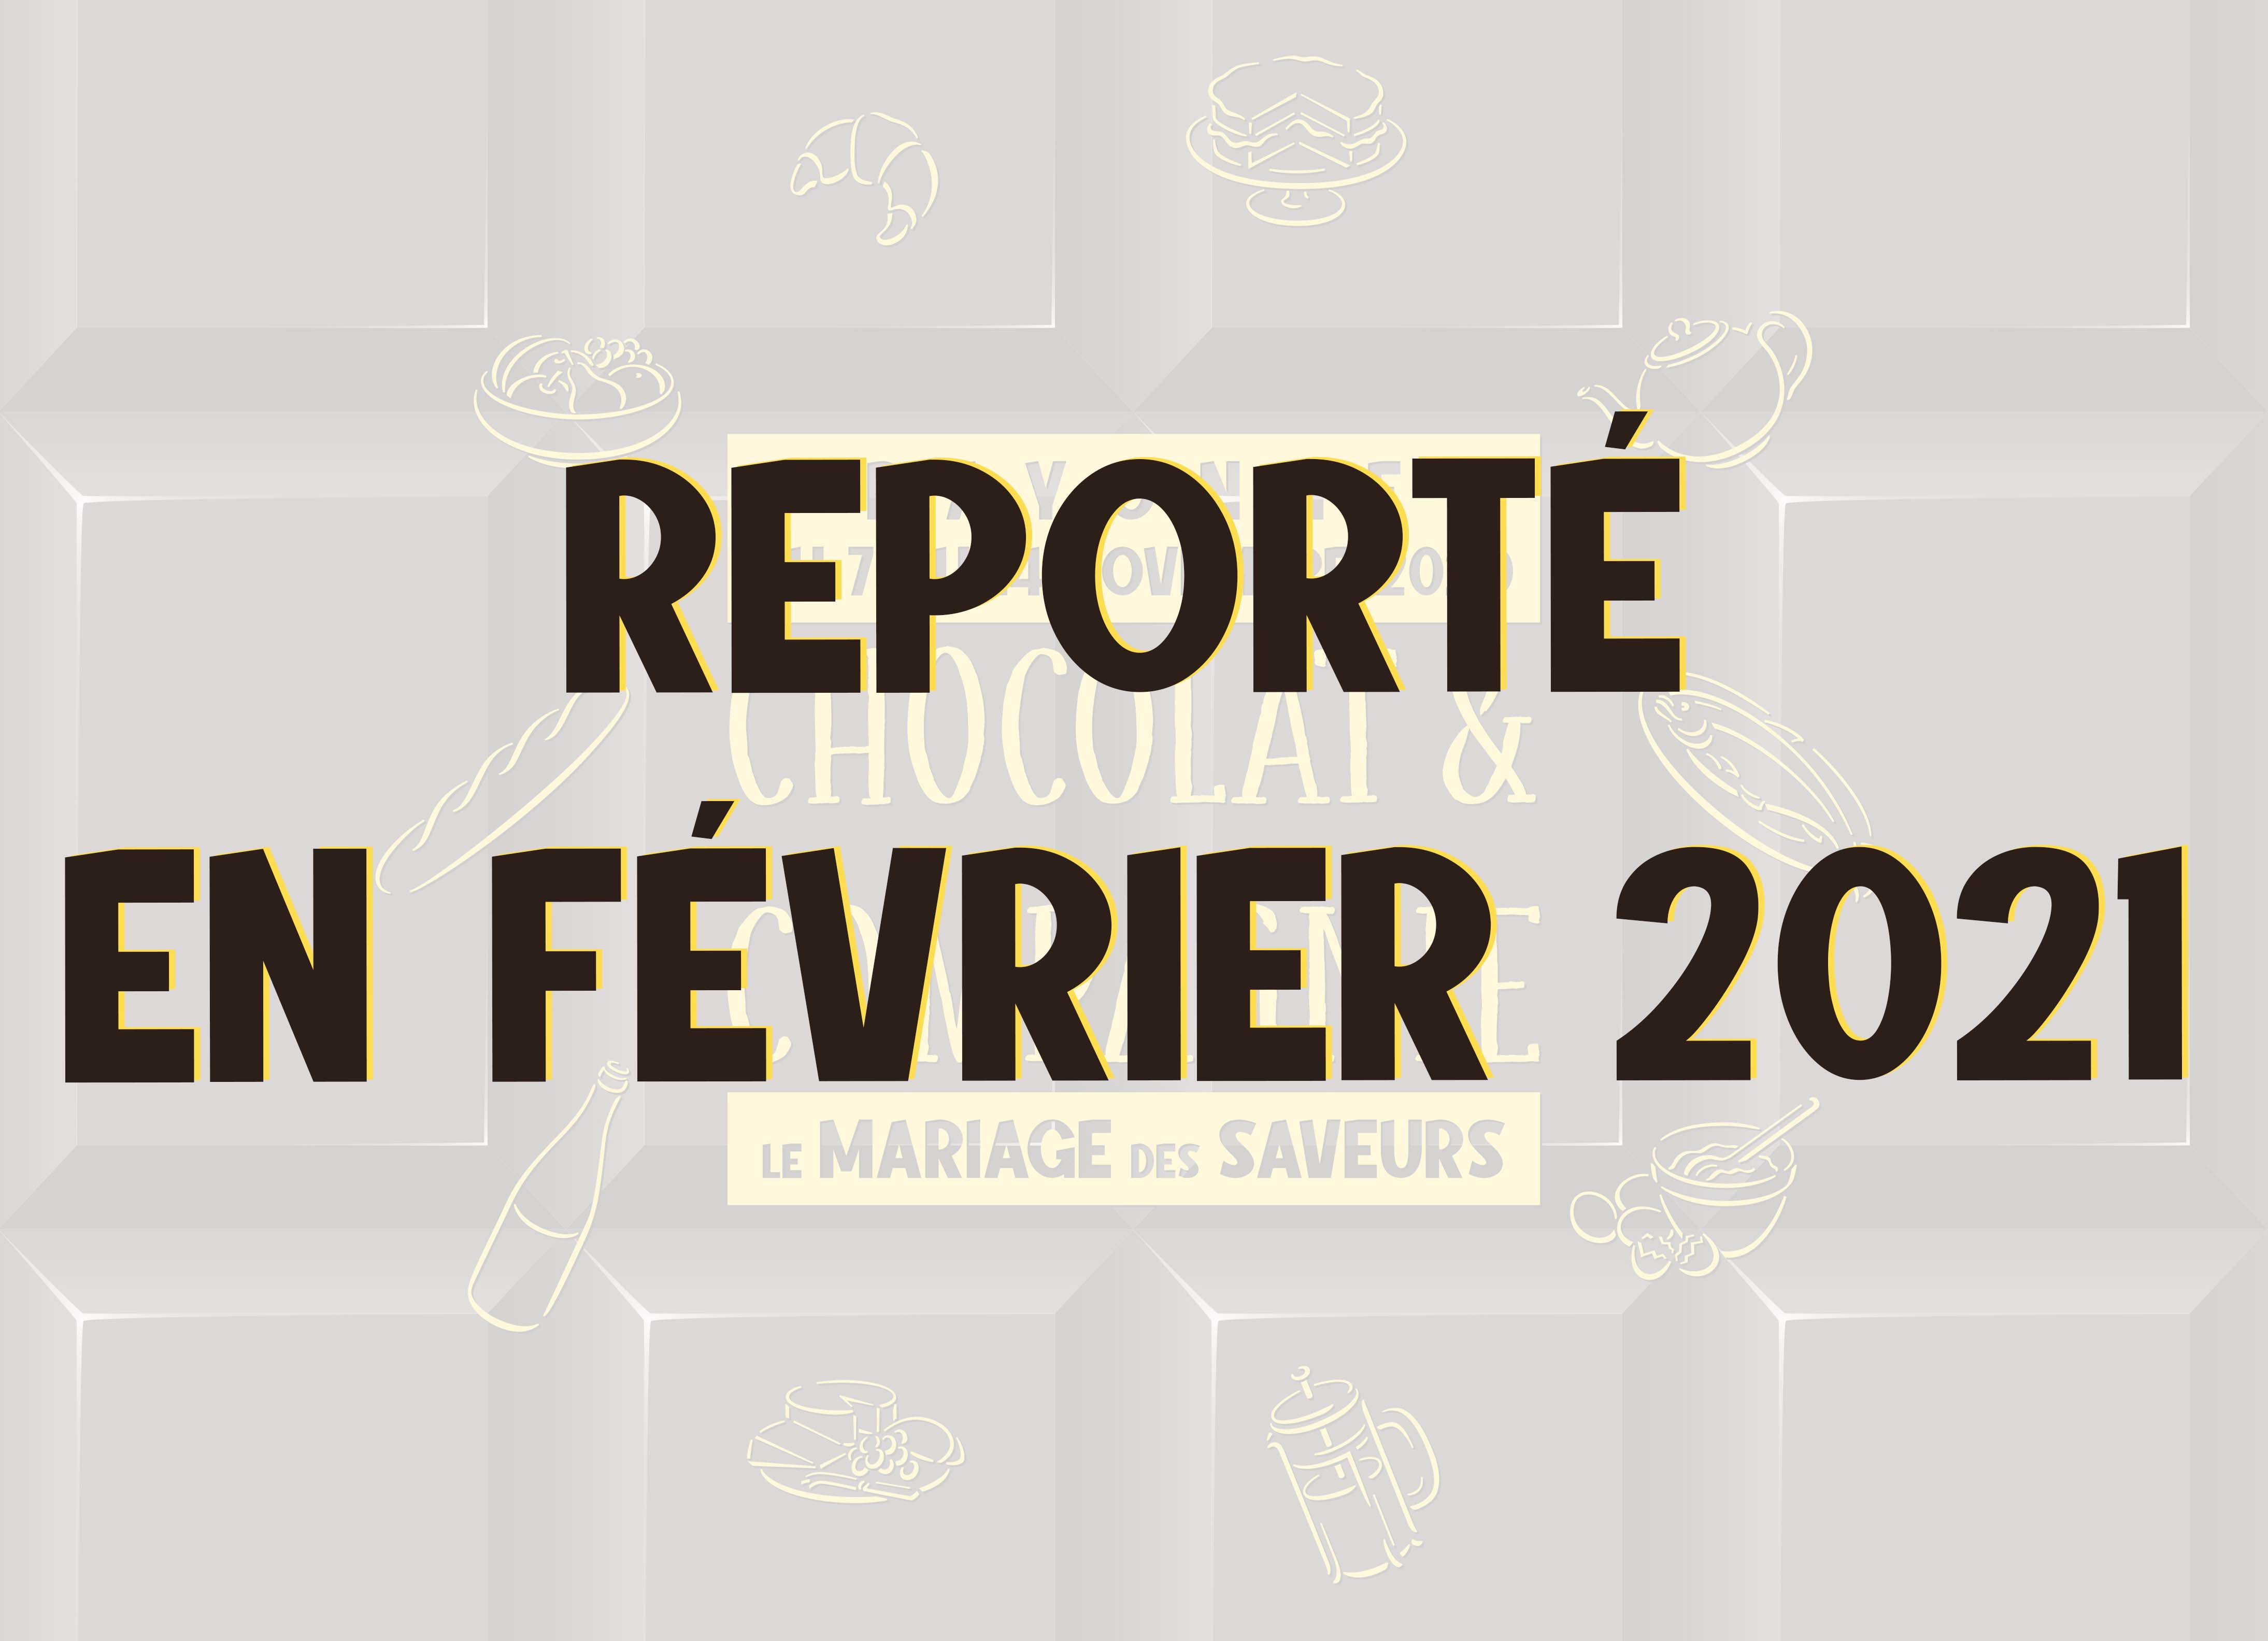 Report de Chocolat et Compagnie